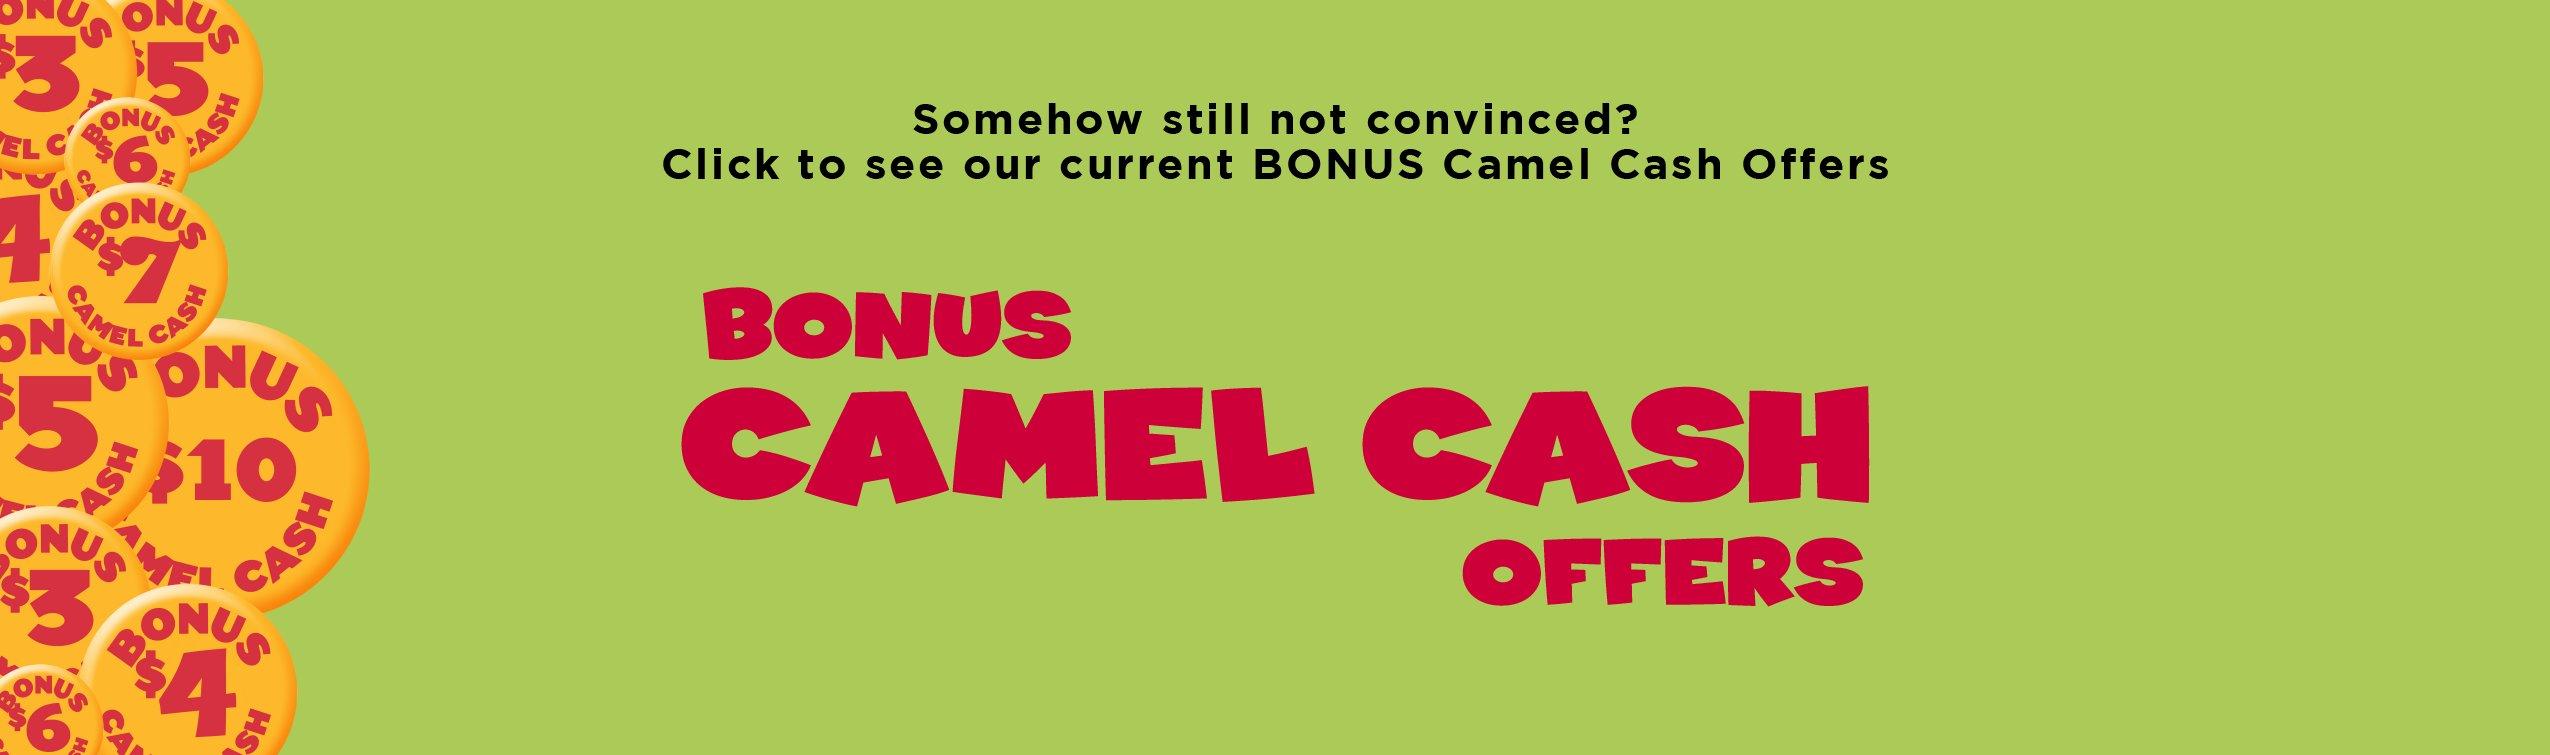 bonus camel cash offers